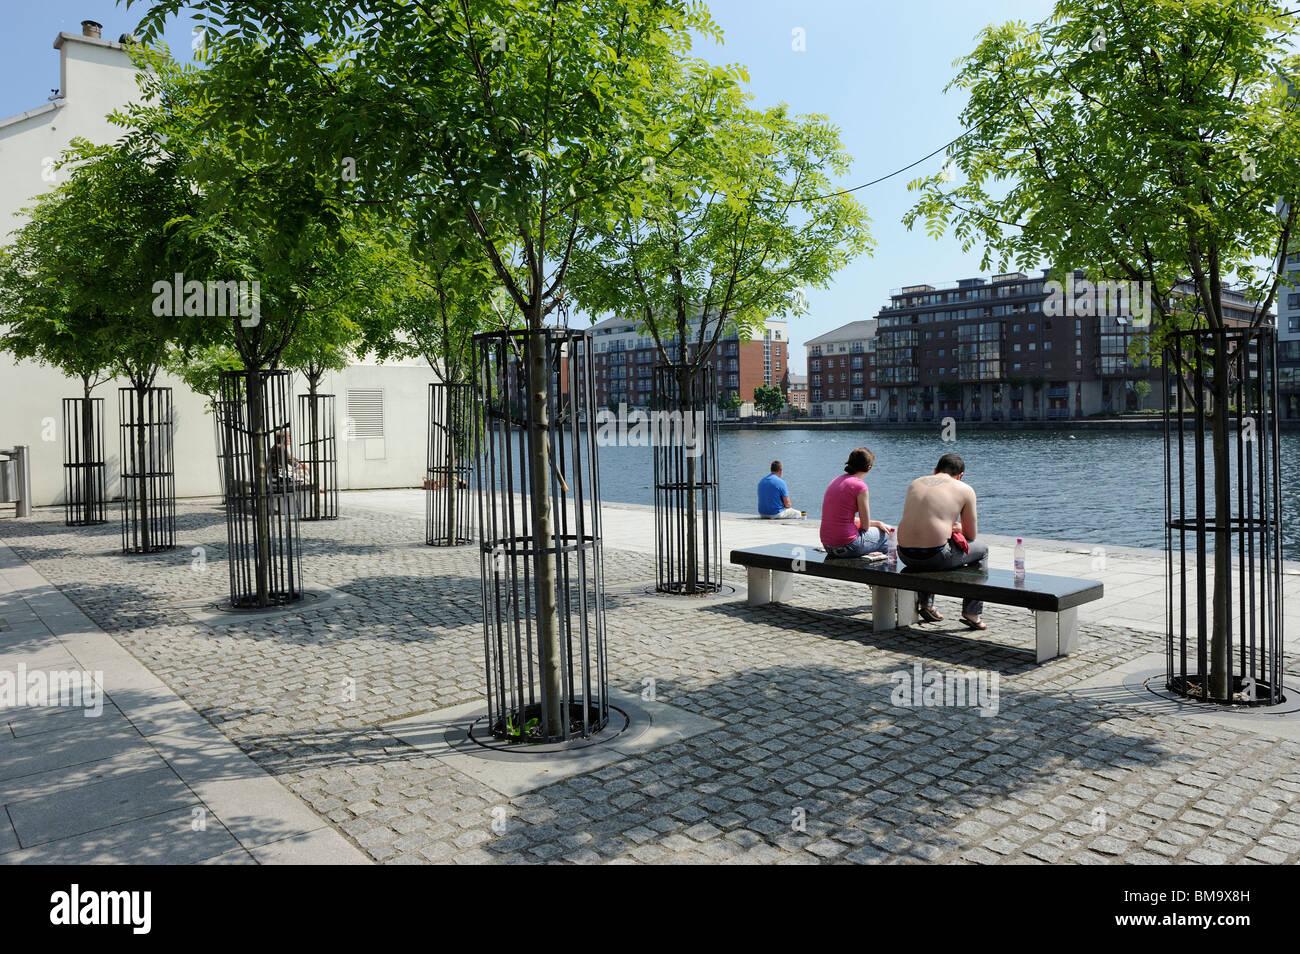 Couple enjoying their leisure time sitting near the river Liffey in Dublin City, Ireland. - Stock Image